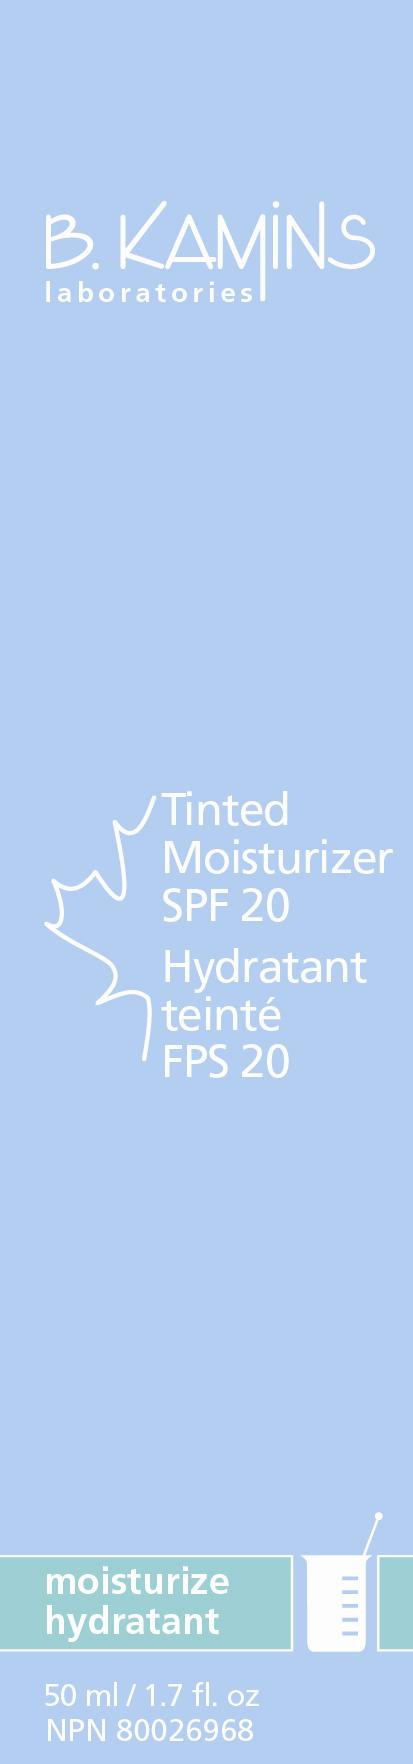 Tinted Moisturizer Spf 20 (Zinc Oxide Titanium Dioxide) Cream [Kamins Dermatologics Inc.]